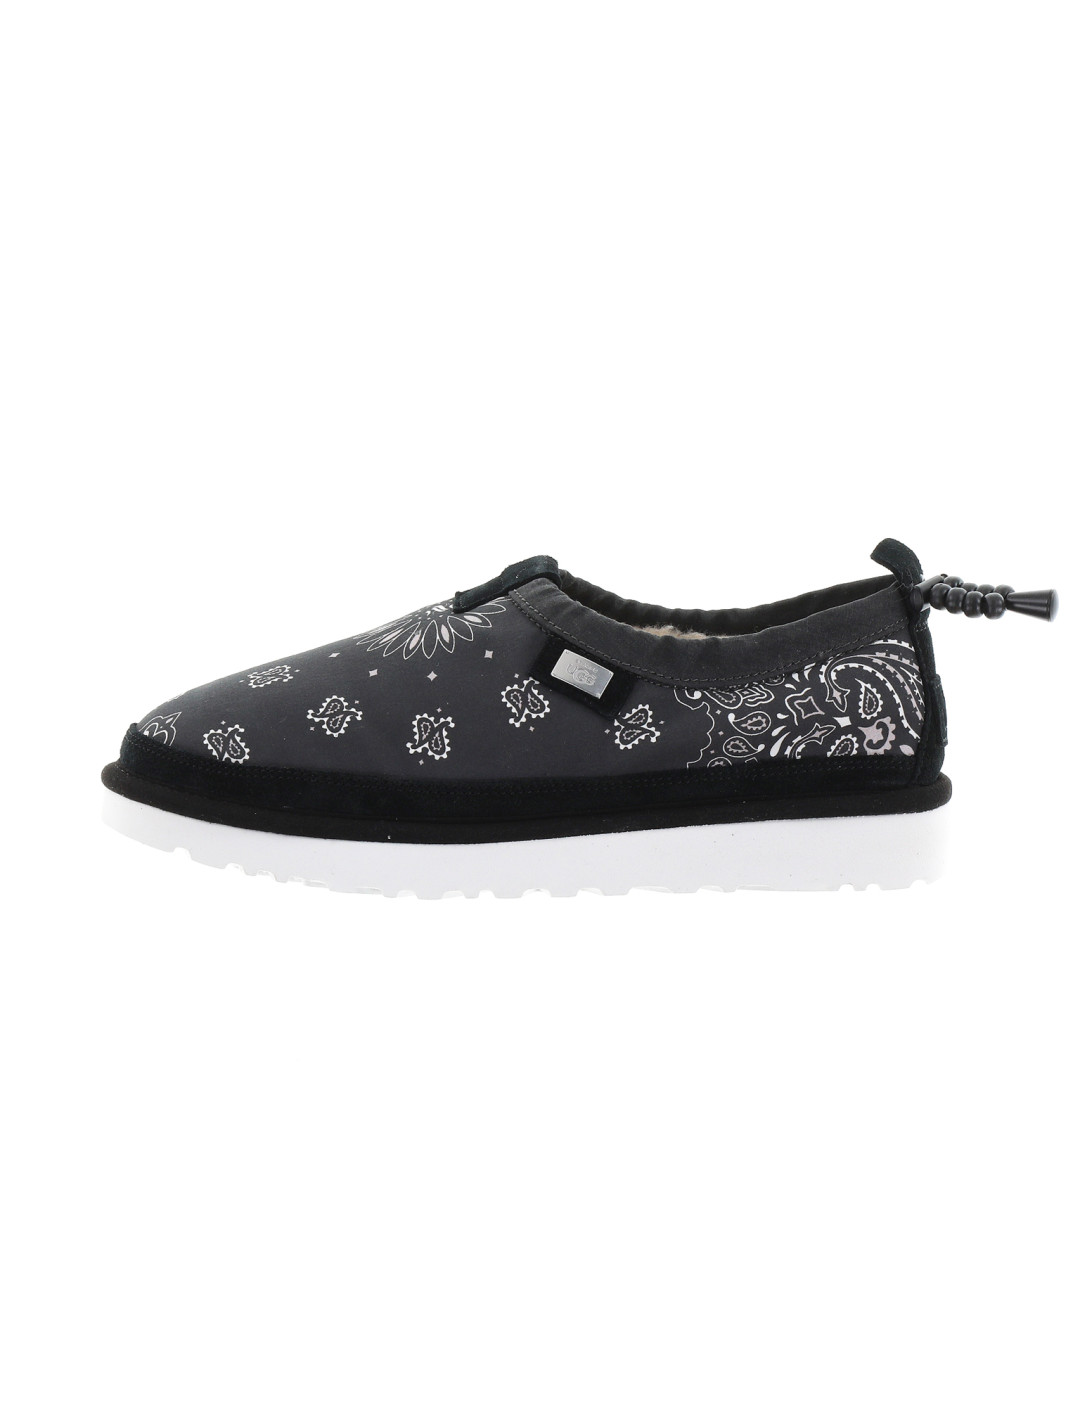 Bandana Tasman Slippers